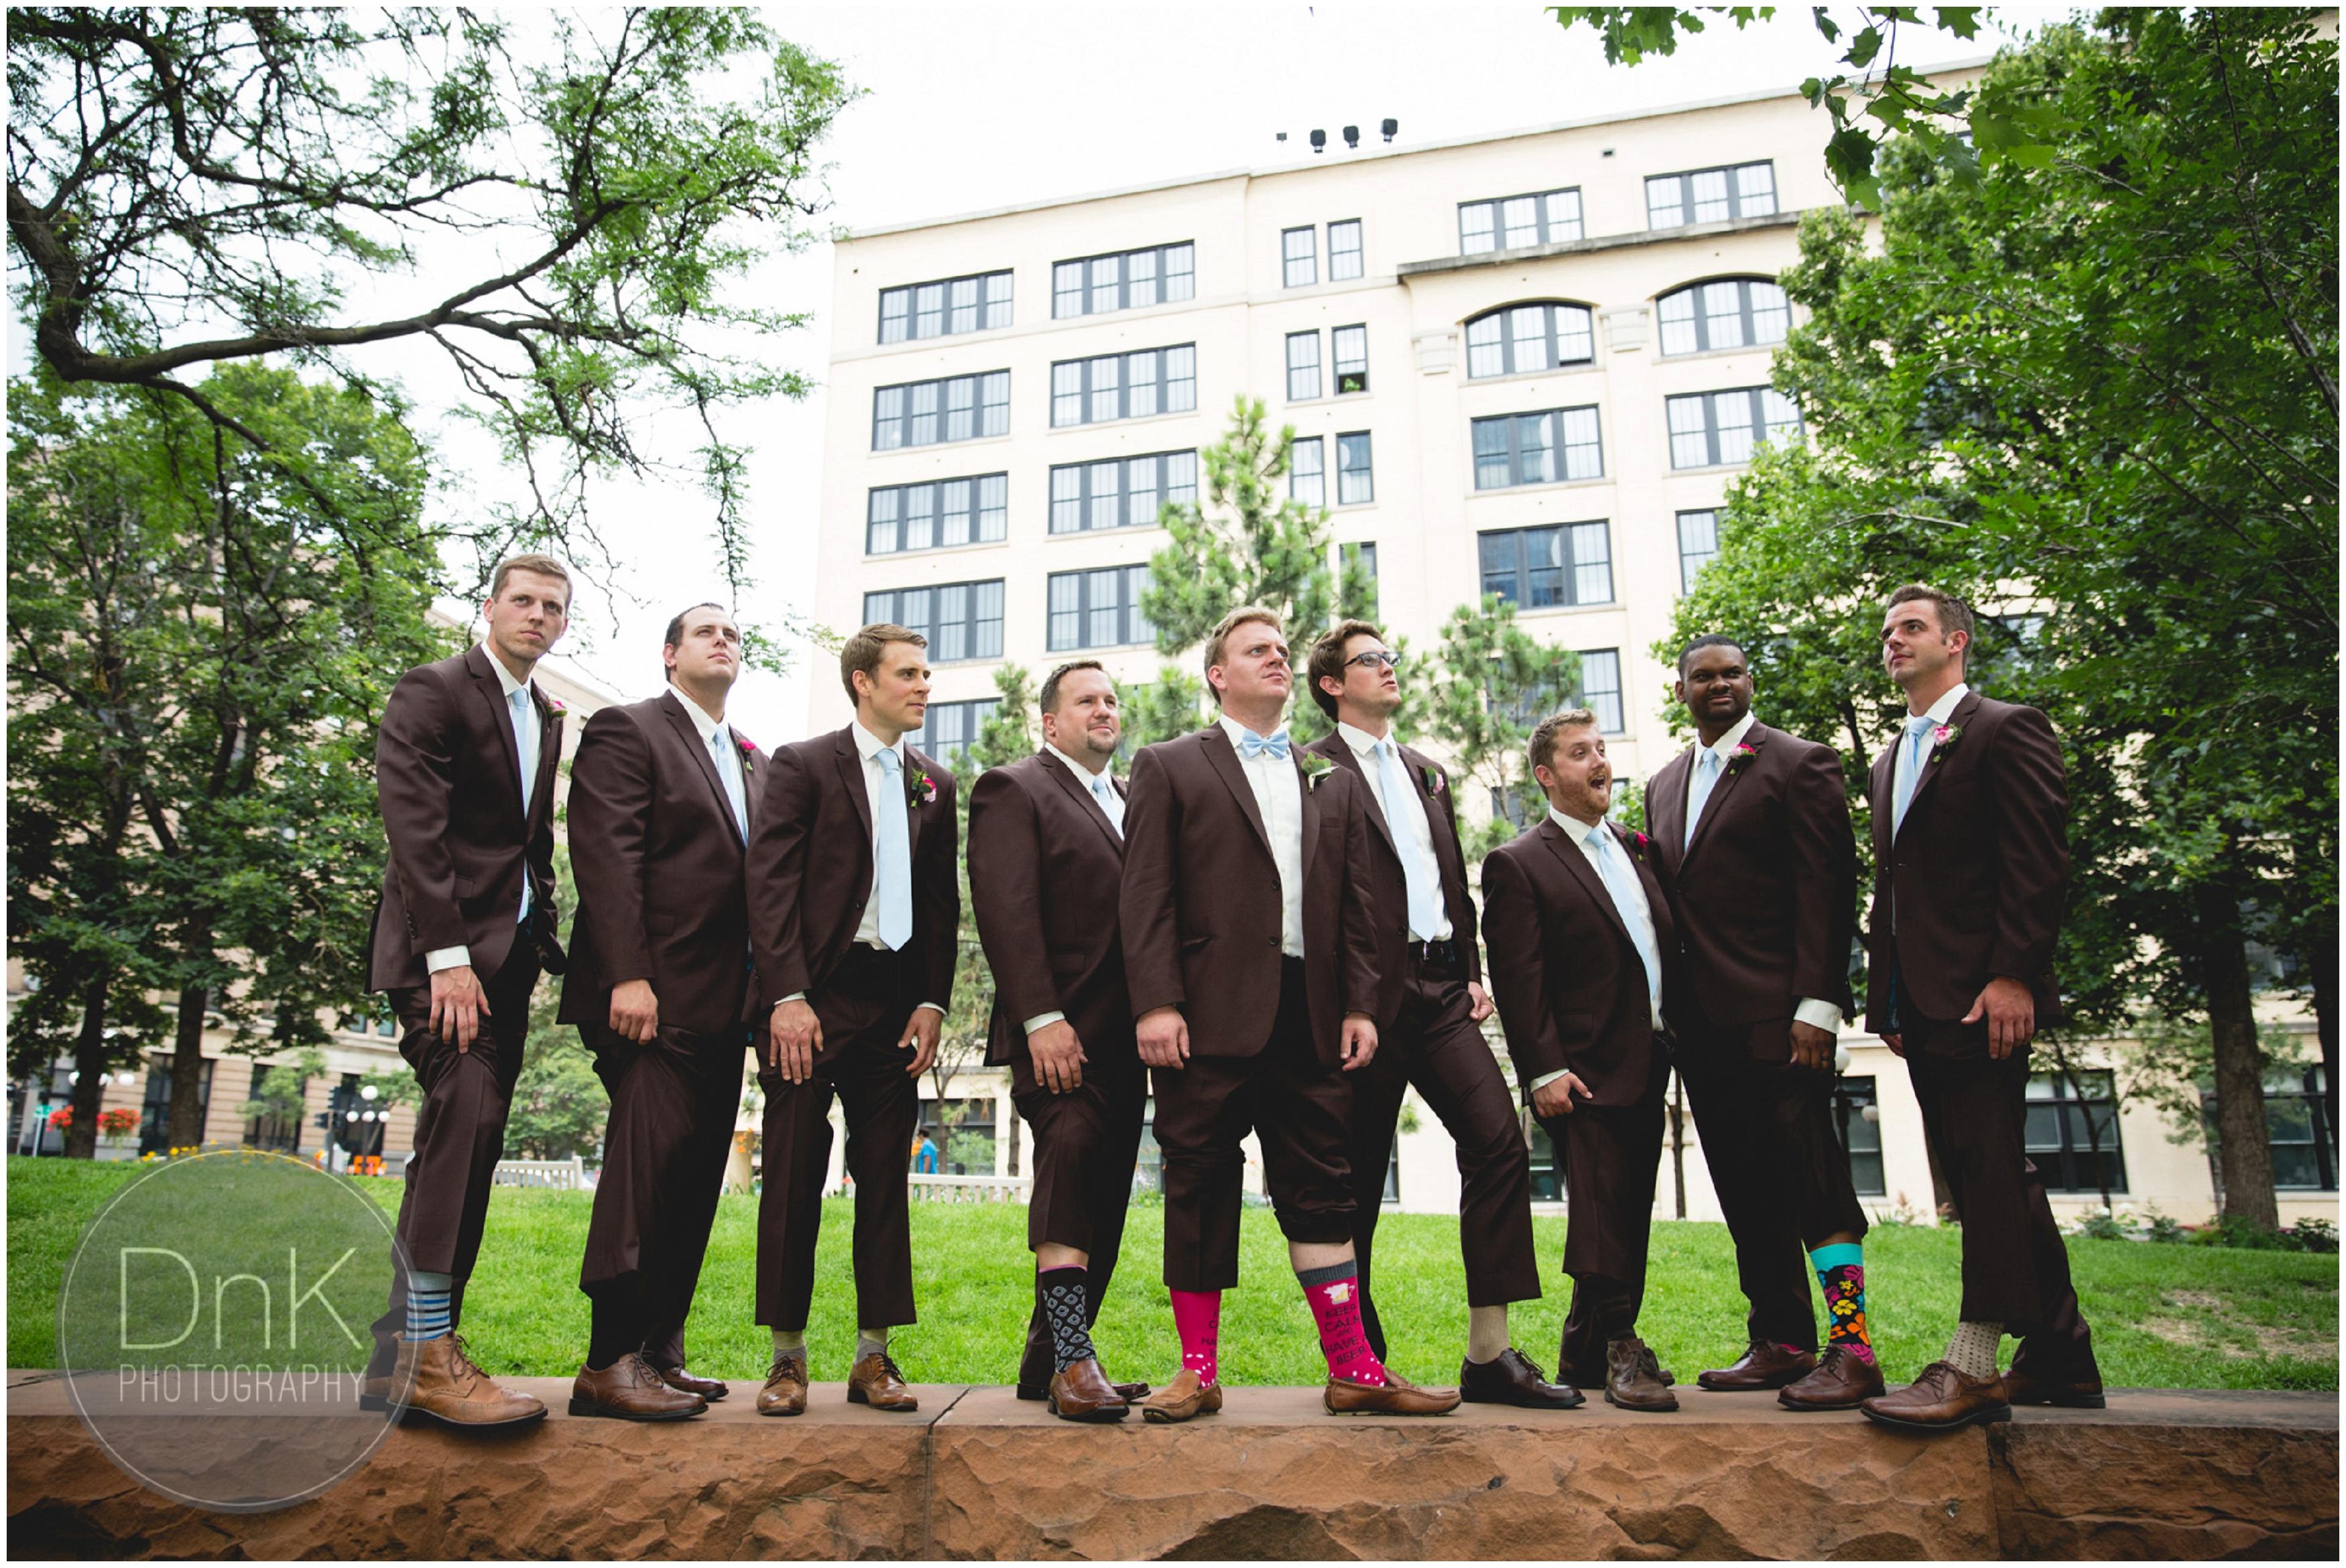 12 - Mears Park Wedding Photos Minneapolis Wedding Photographer